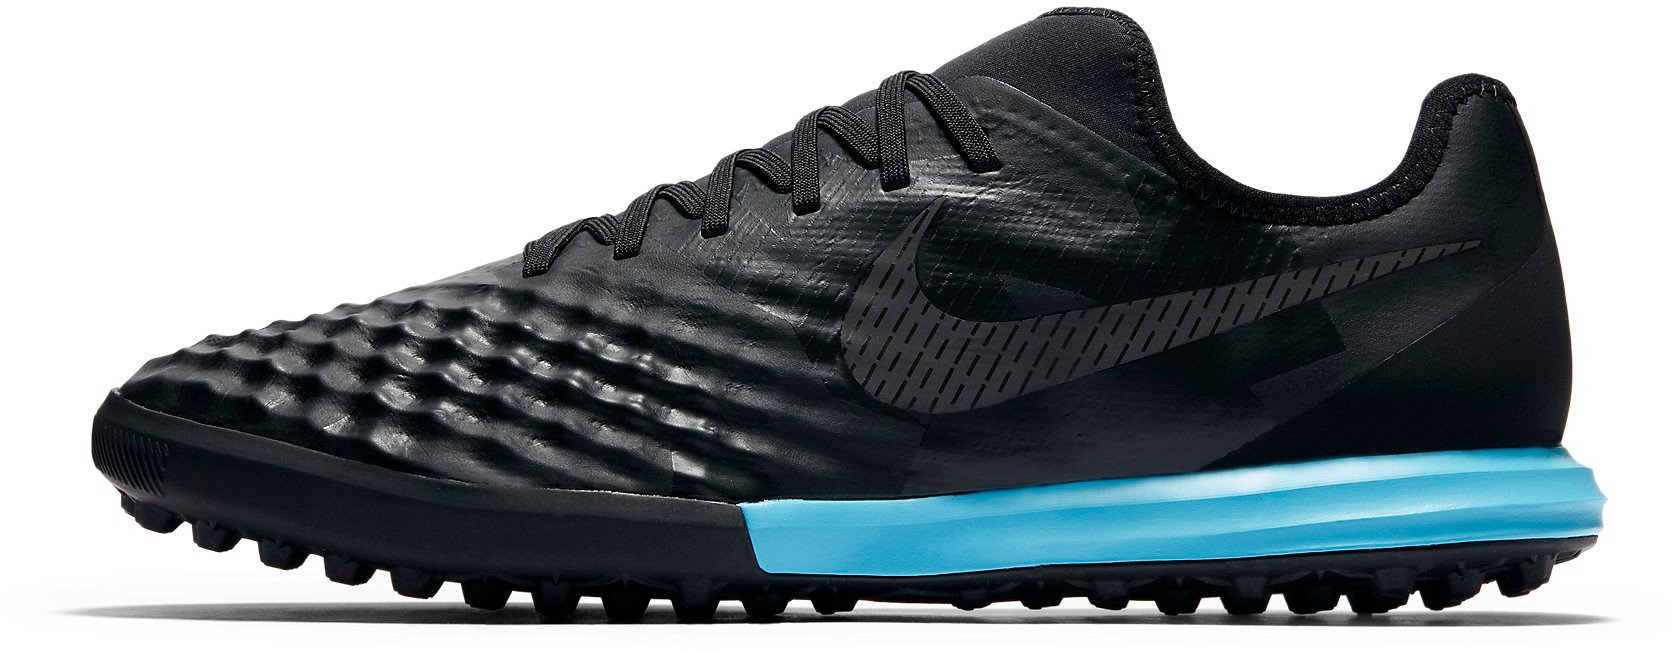 de acuerdo a aislamiento Cristo  Football shoes Nike MAGISTAX FINALE II SE TF - Top4Football.com